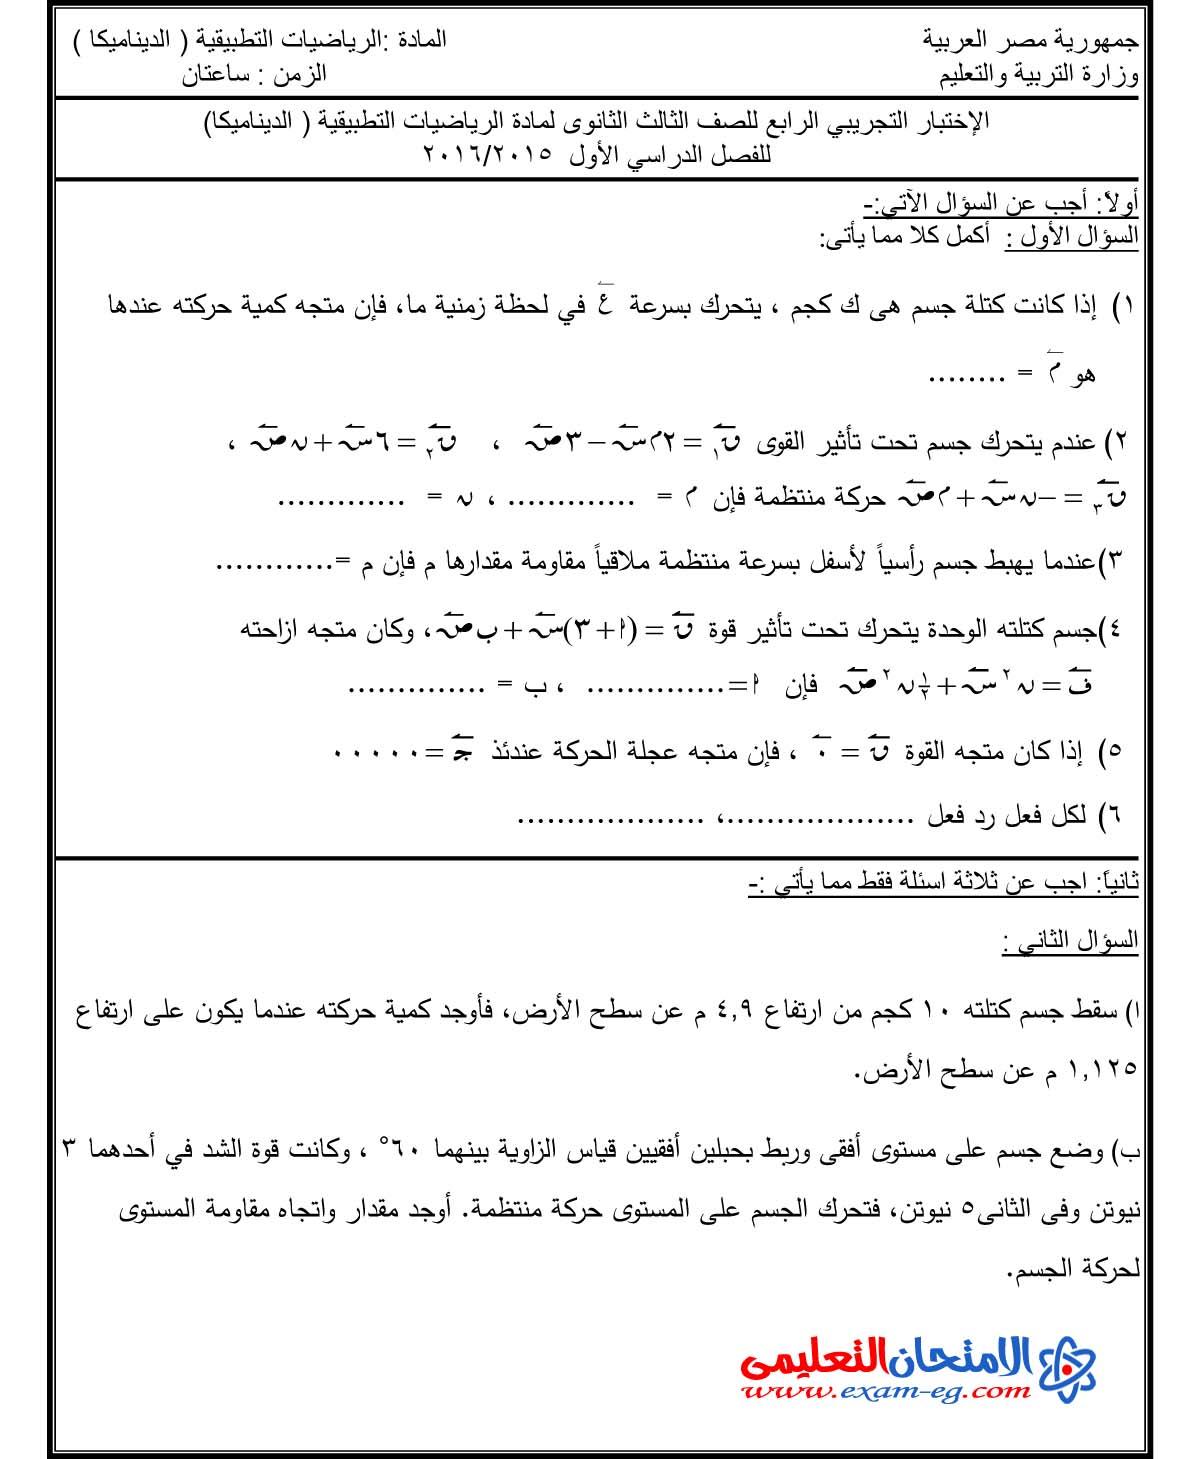 exam-eg.com_1460420681117.jpg